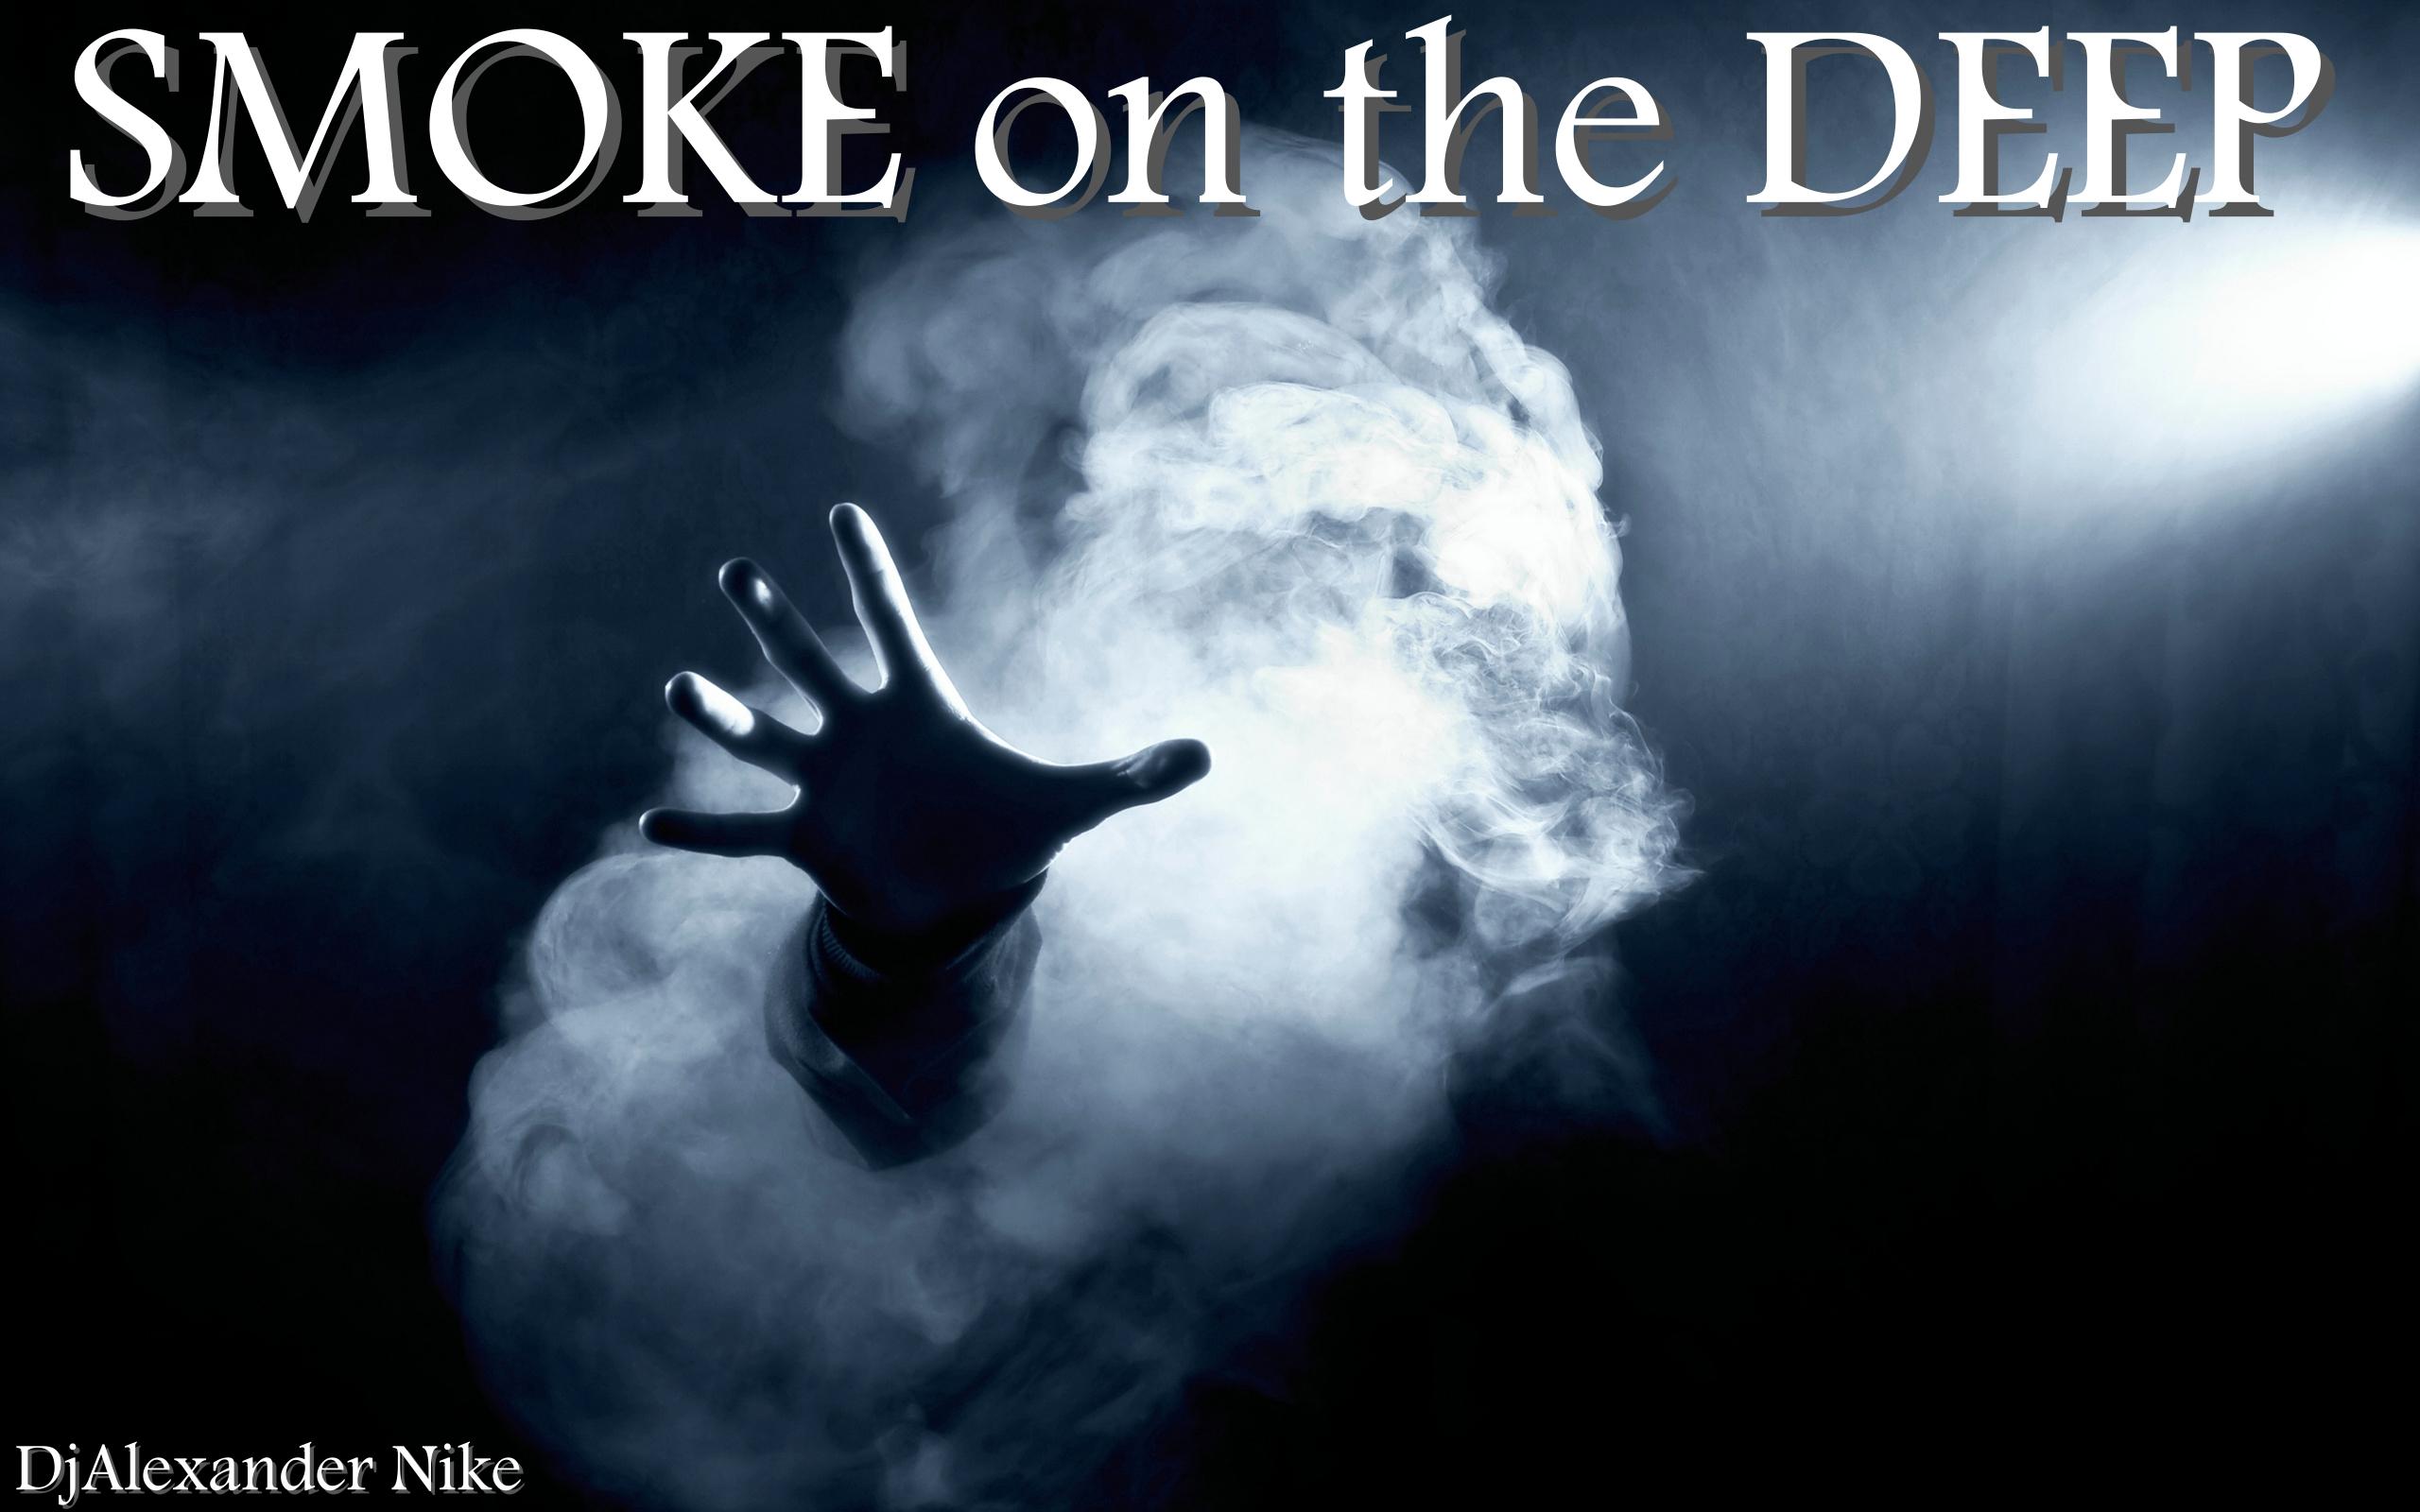 Dj Alexander Nike - smoke on the deep (Deep House mix) ()